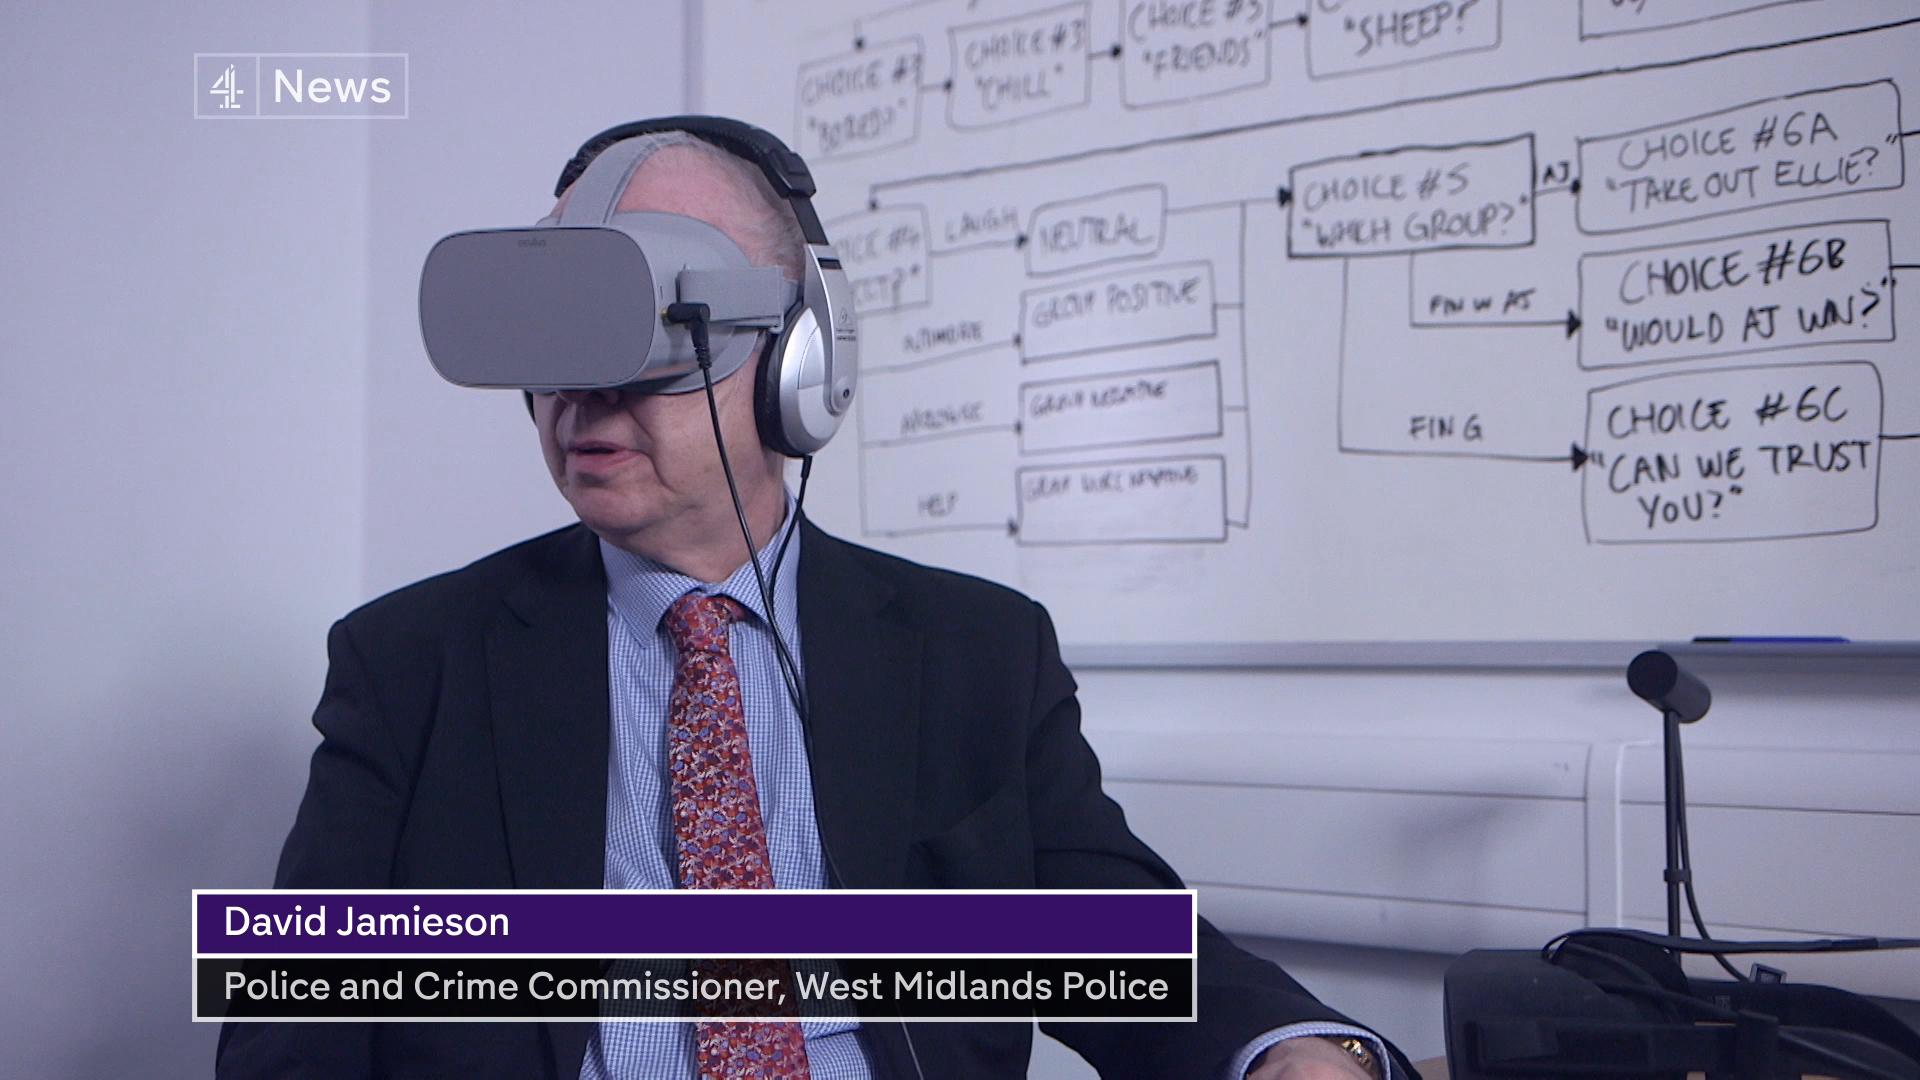 police_commissioner.jpg